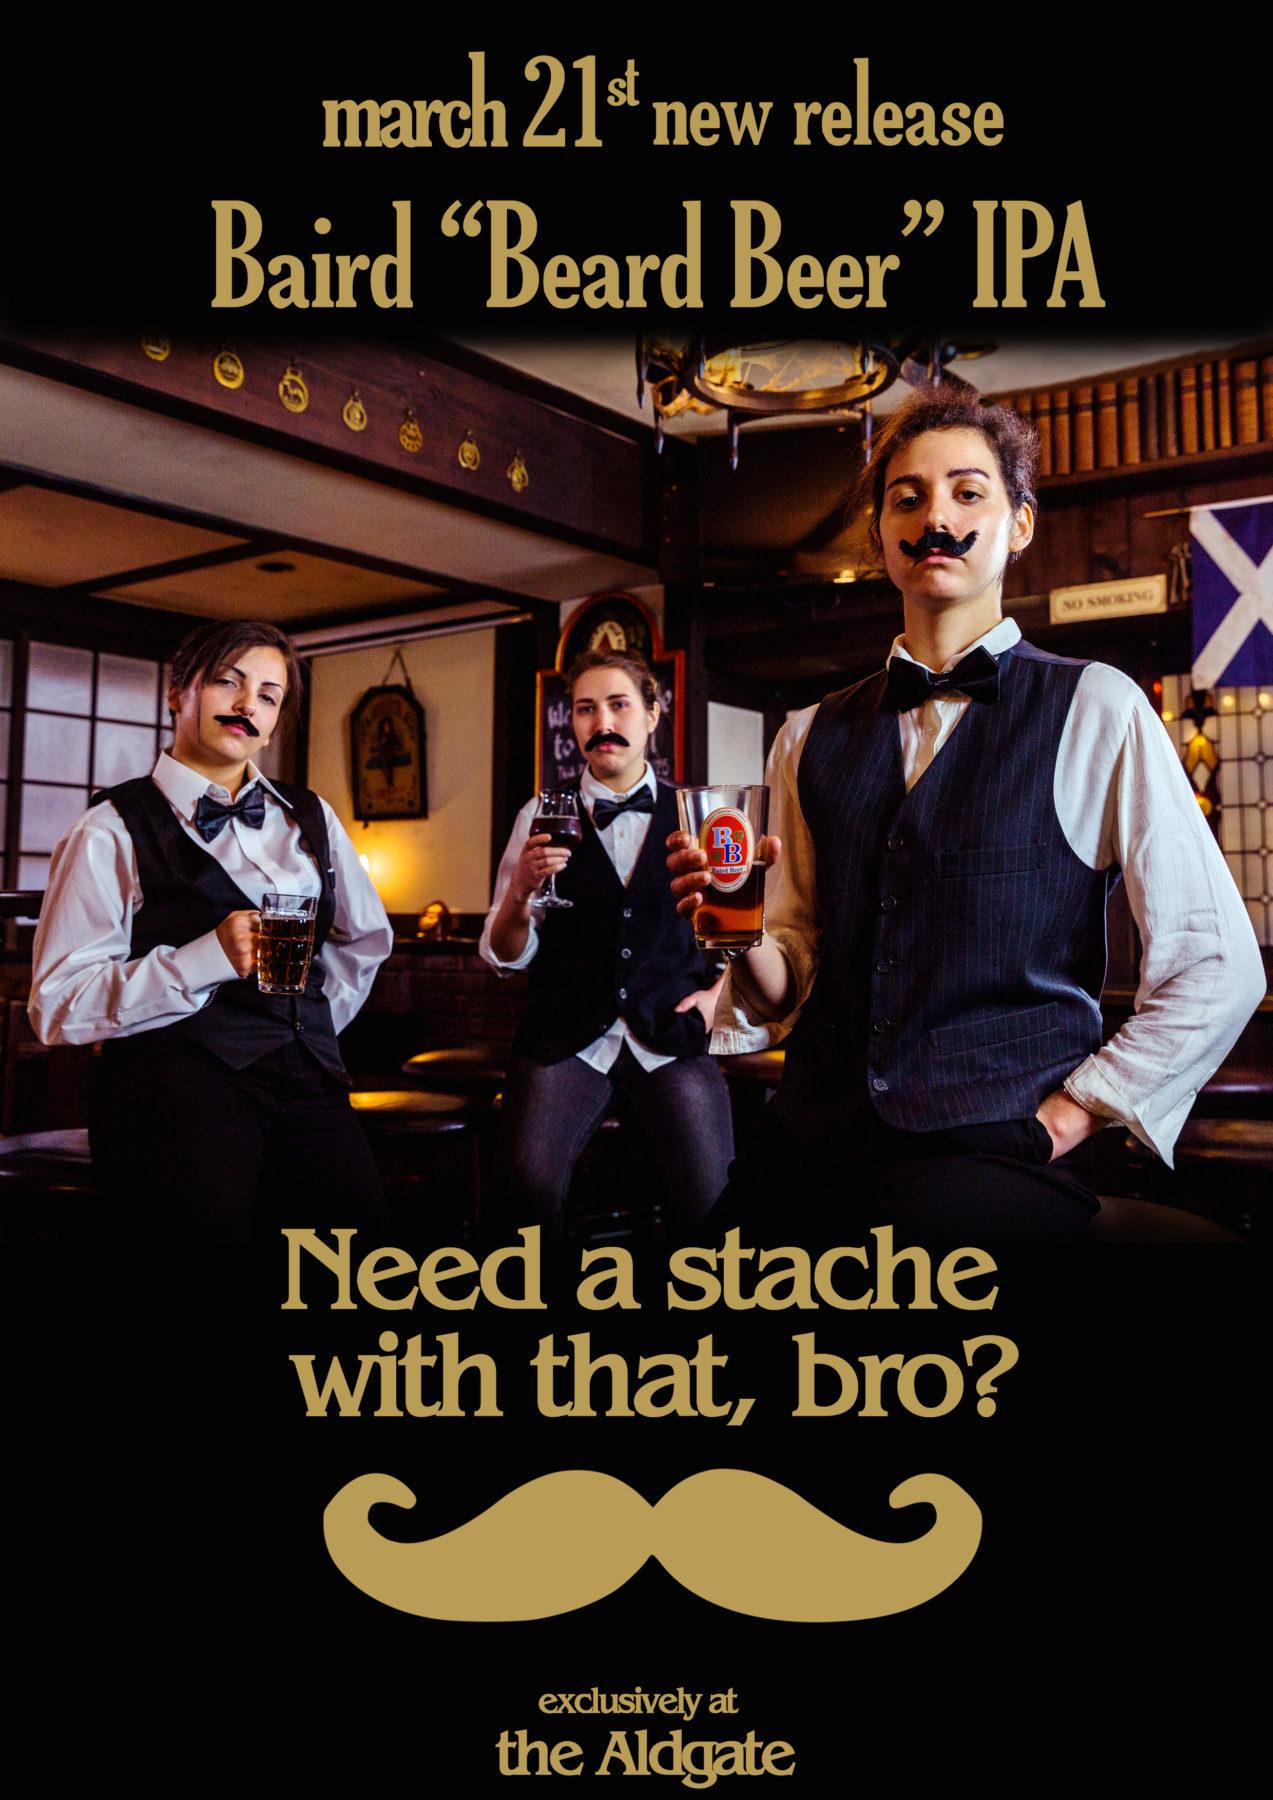 baird beard beer ipa for the aldgate